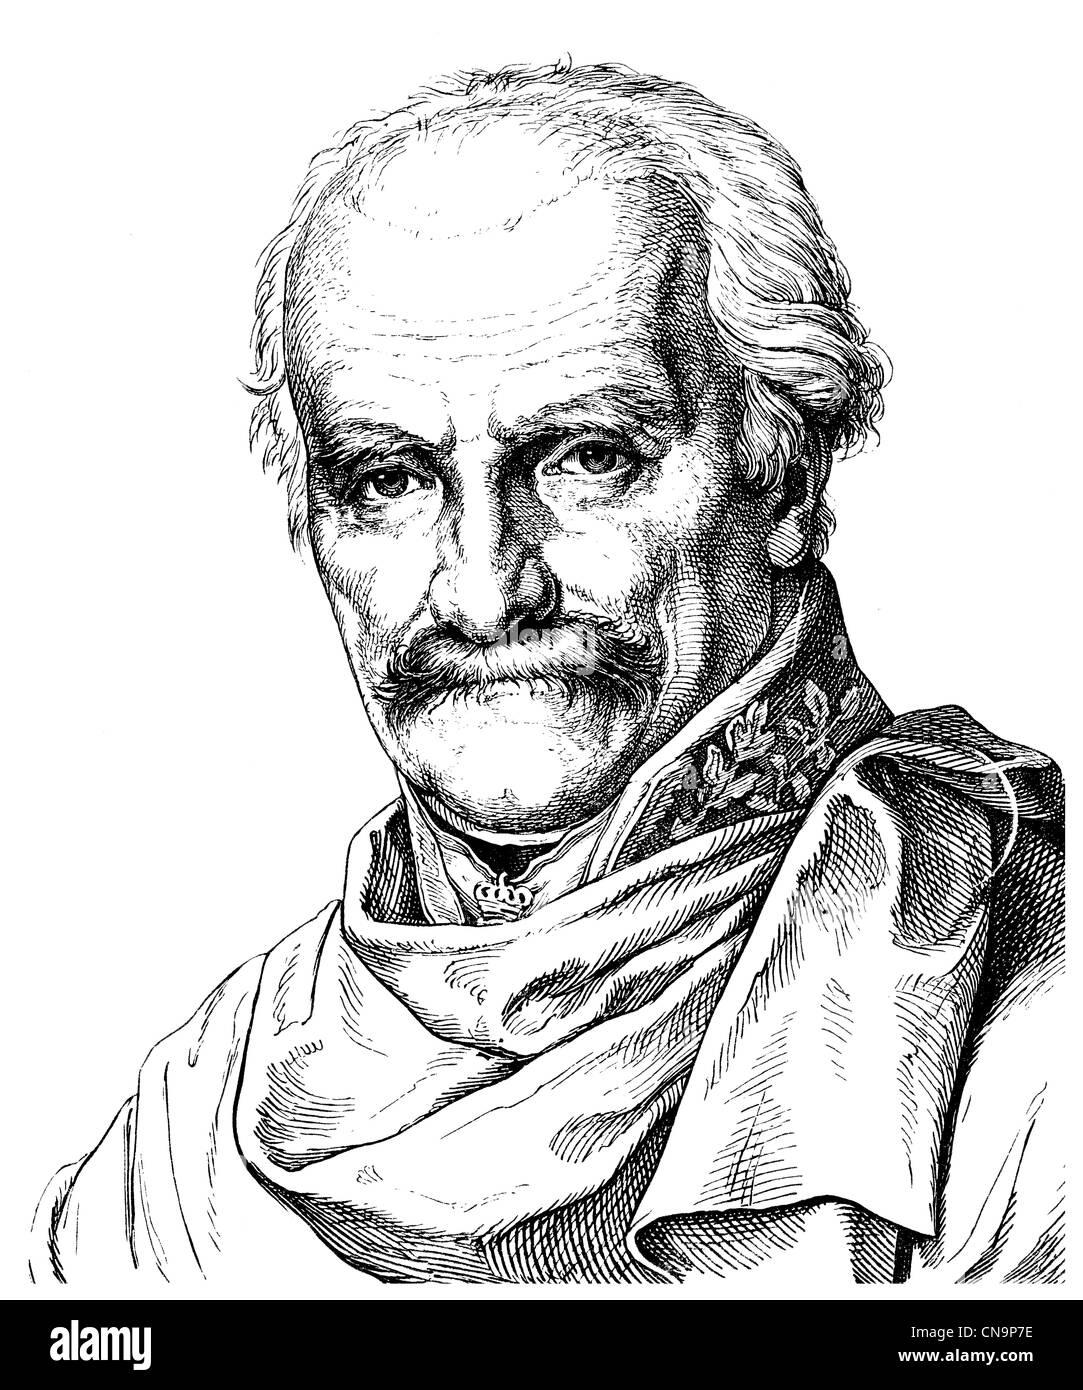 Gebhard Leberecht von Bluecher, Prince of Wahlstatt or Marshal Forward, 1742 - 1819, a Prussian Field Marshal Stock Photo